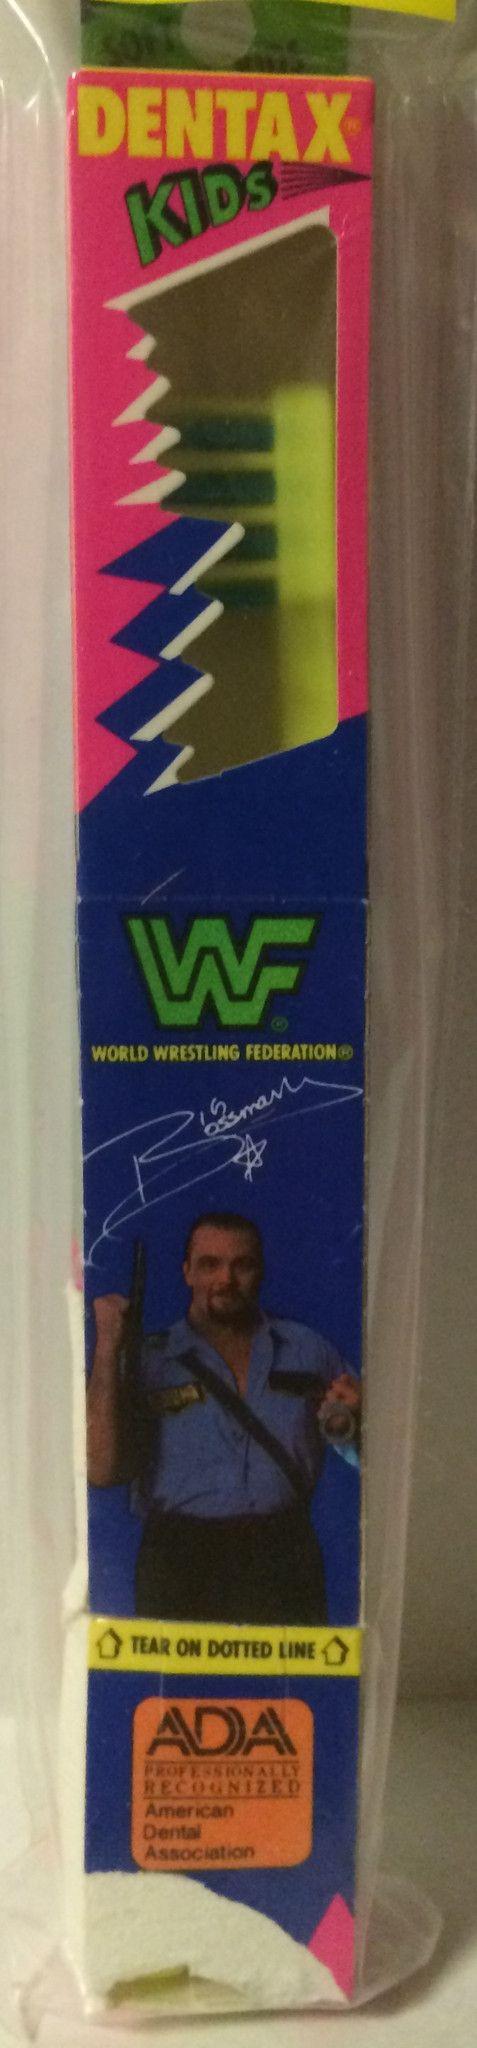 (GBS04605) - WWF WWE WCW nWo Wrestling Dentax Kids Toothbrush - Big Boss Man